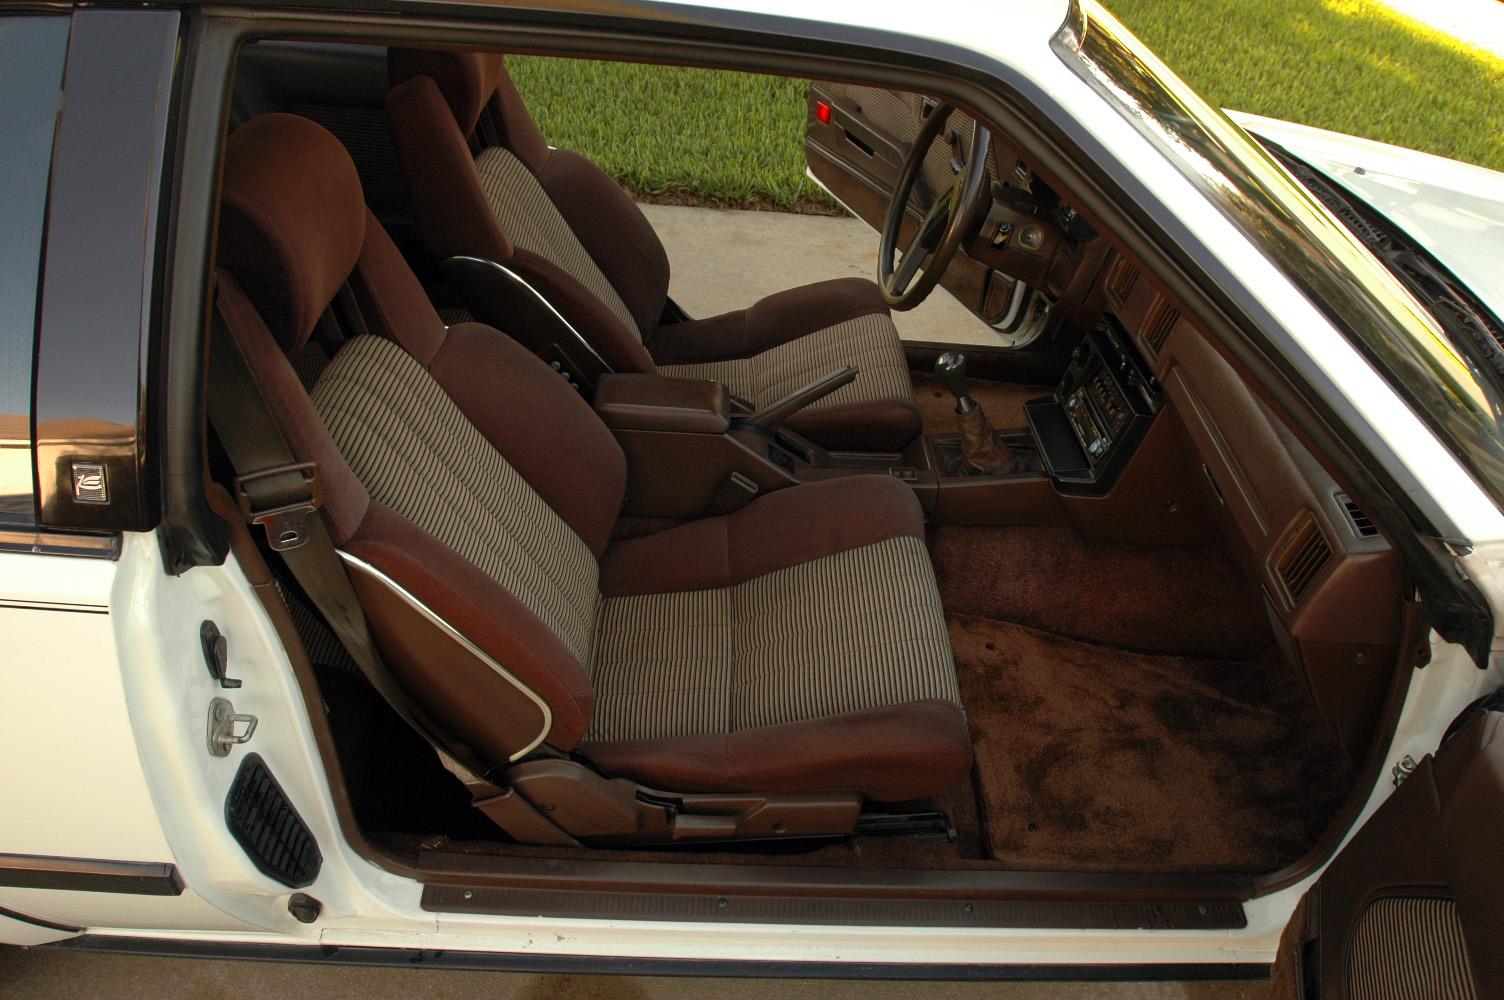 Batmanstoys Toyota Celica Gts 1983 6 479109 Bytes